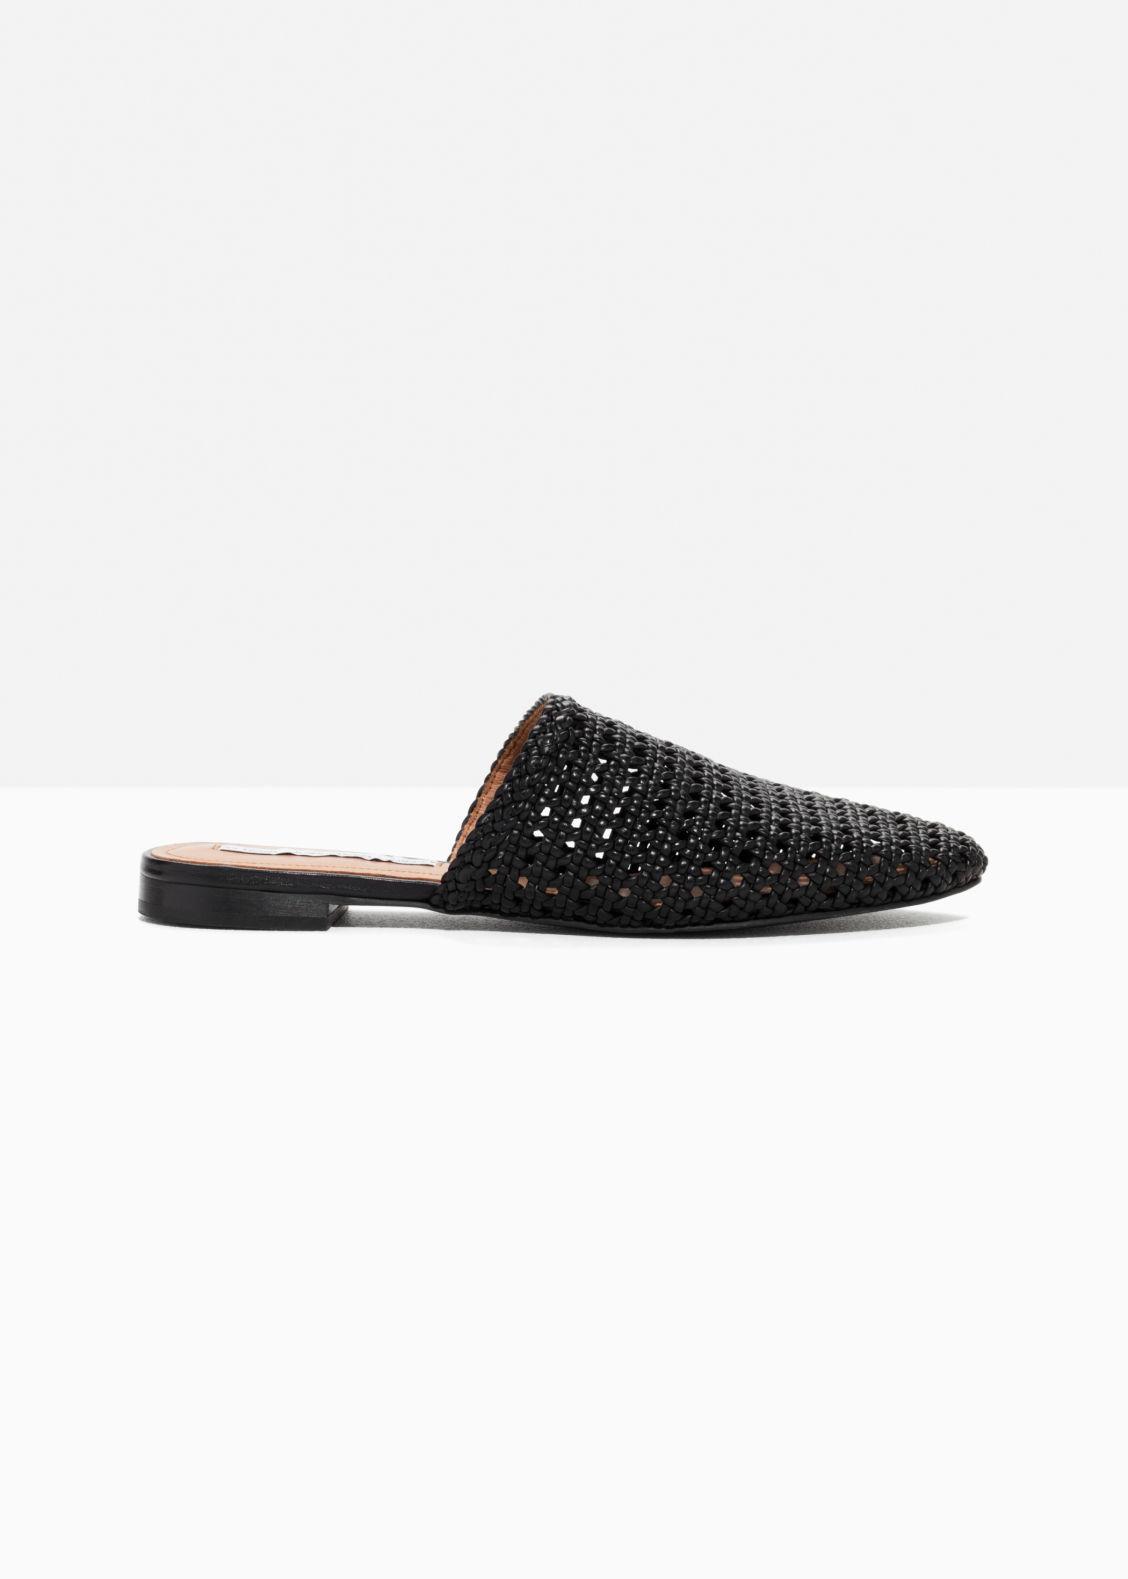 & OTHER STORIES Braided Leather Slippers - Black Orden de venta barata Barato para barato Venta caliente en línea Opción de venta barata lumyd